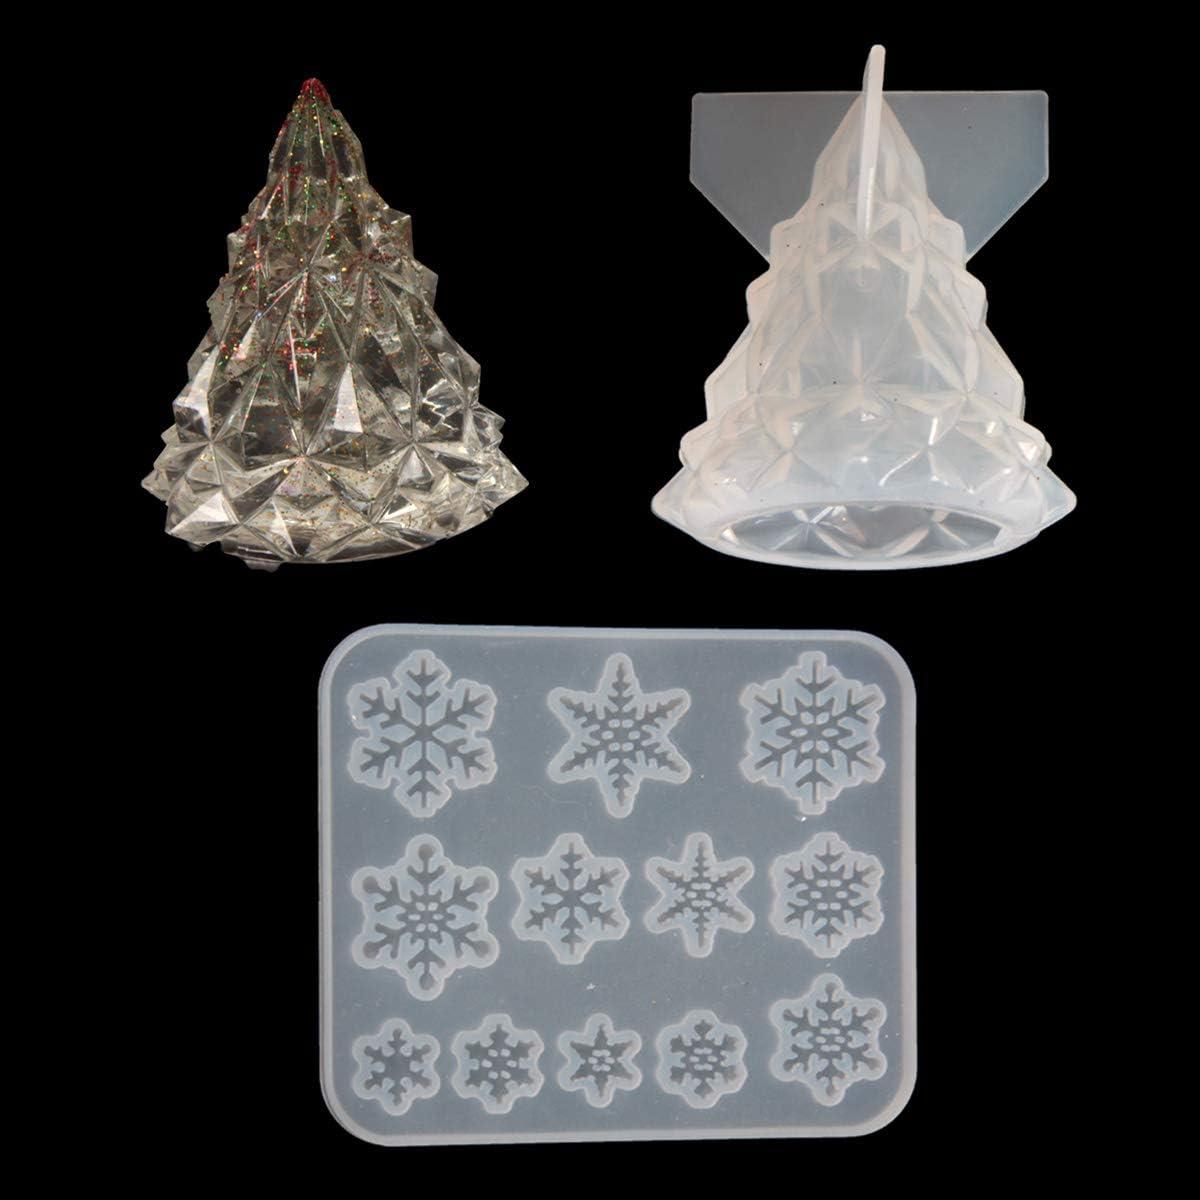 yalansmaiP Christmas Tree Resin Epoxy Finally popular brand Shaped 2021 spring and summer new Mold